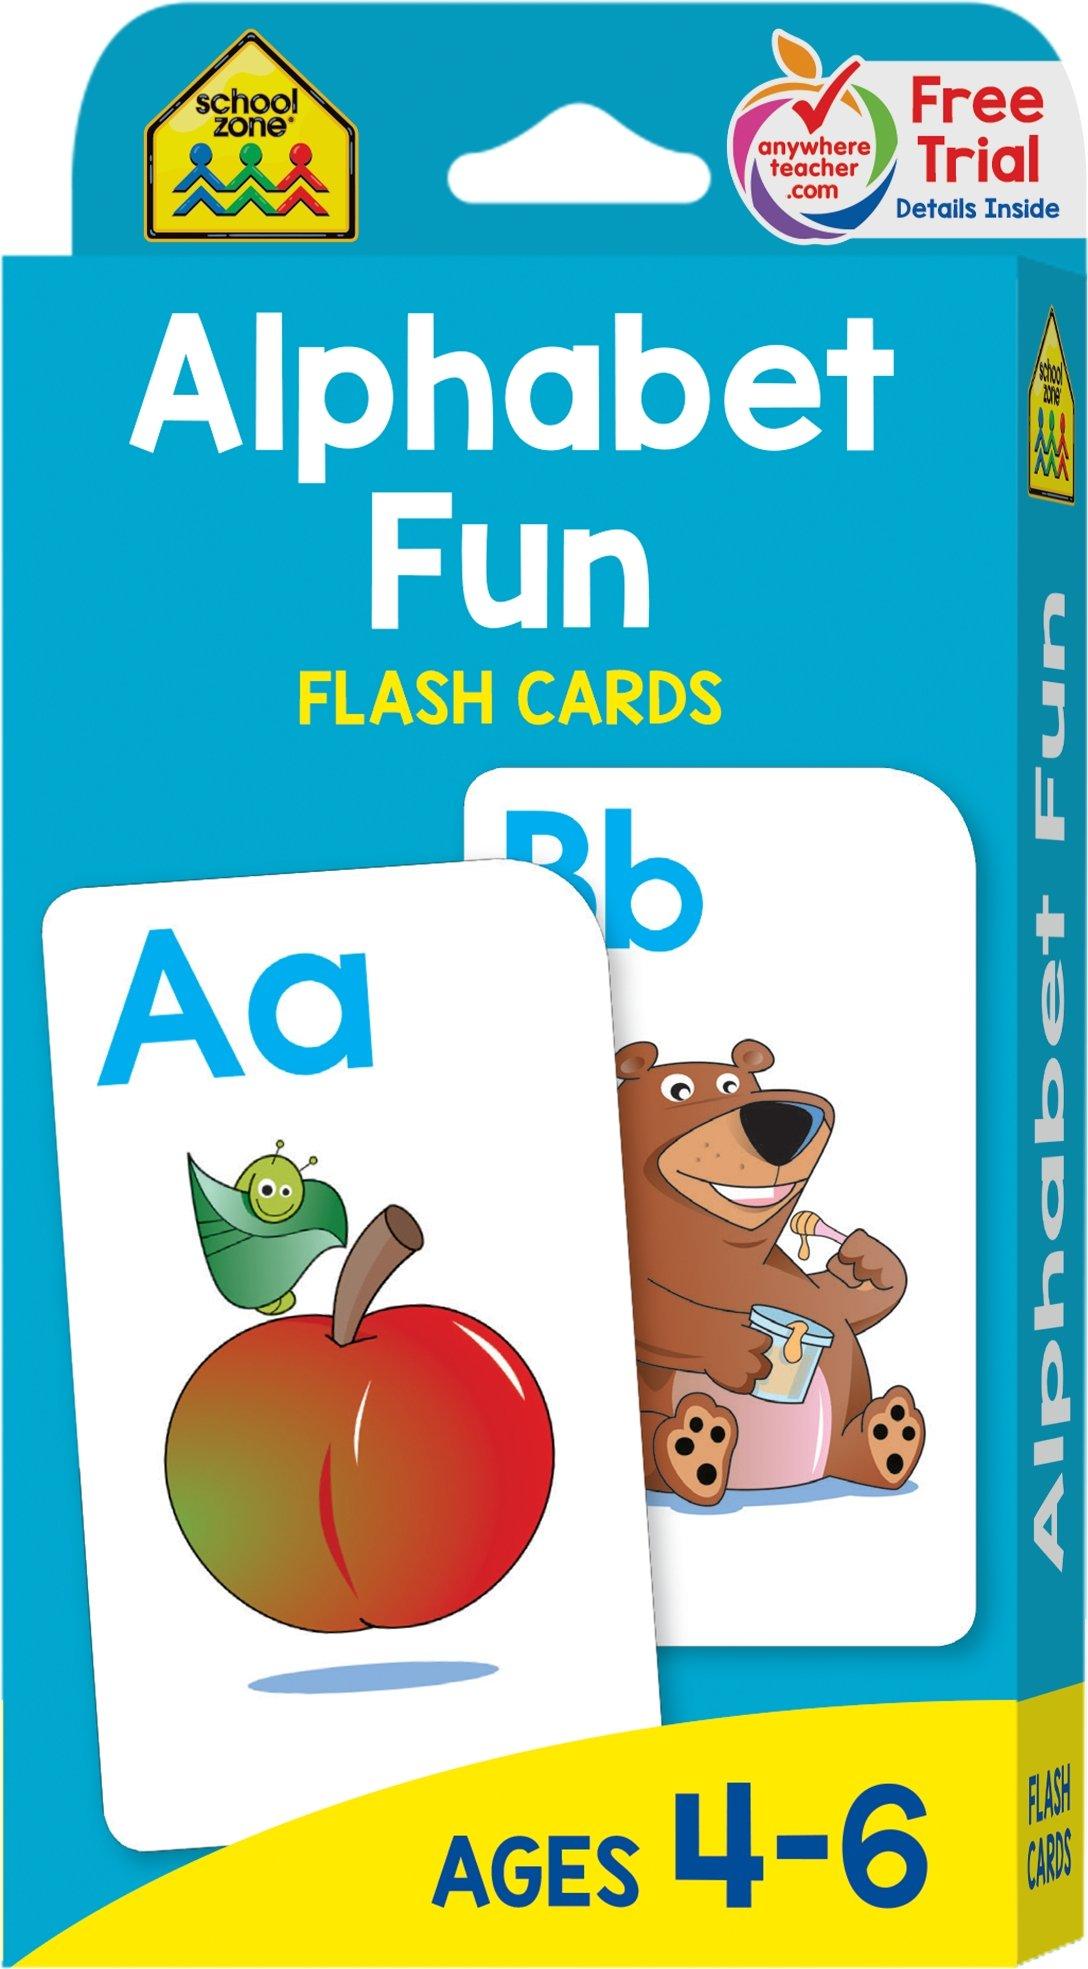 School Zone - Alphabet Fun Flash Cards - Ages 4 to 6, Preschool ...